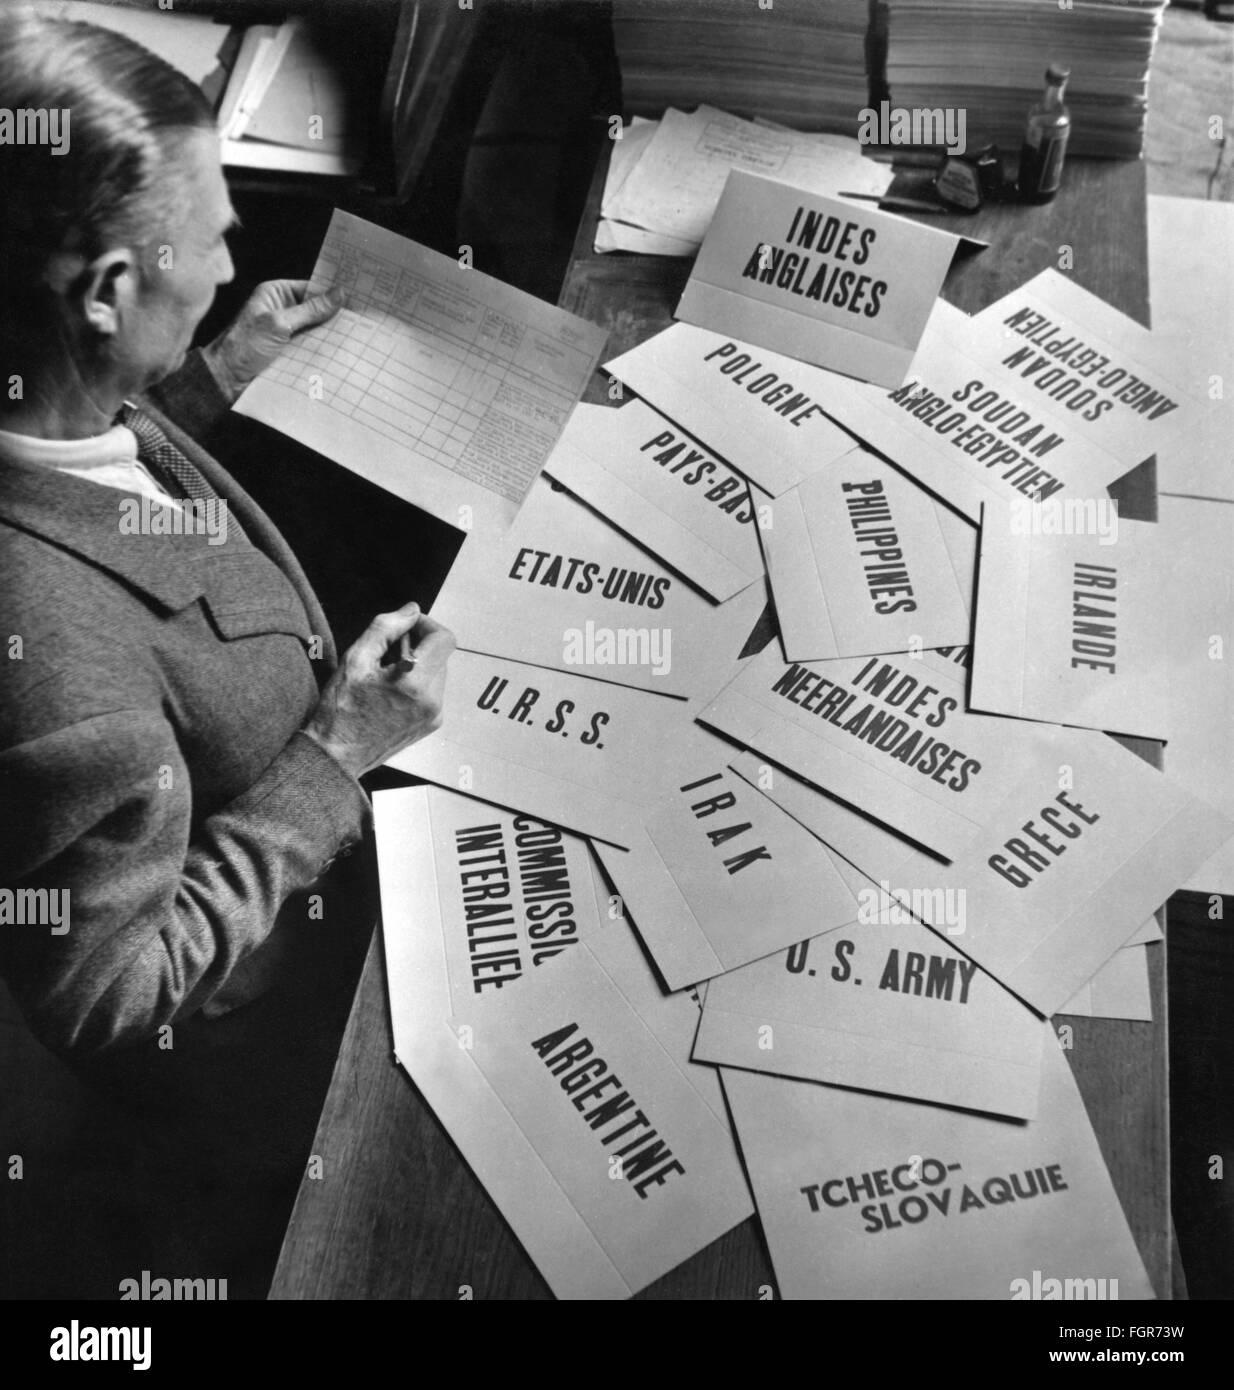 Paris Peace Conference 29.7.- 15.10.1946 - Stock Image